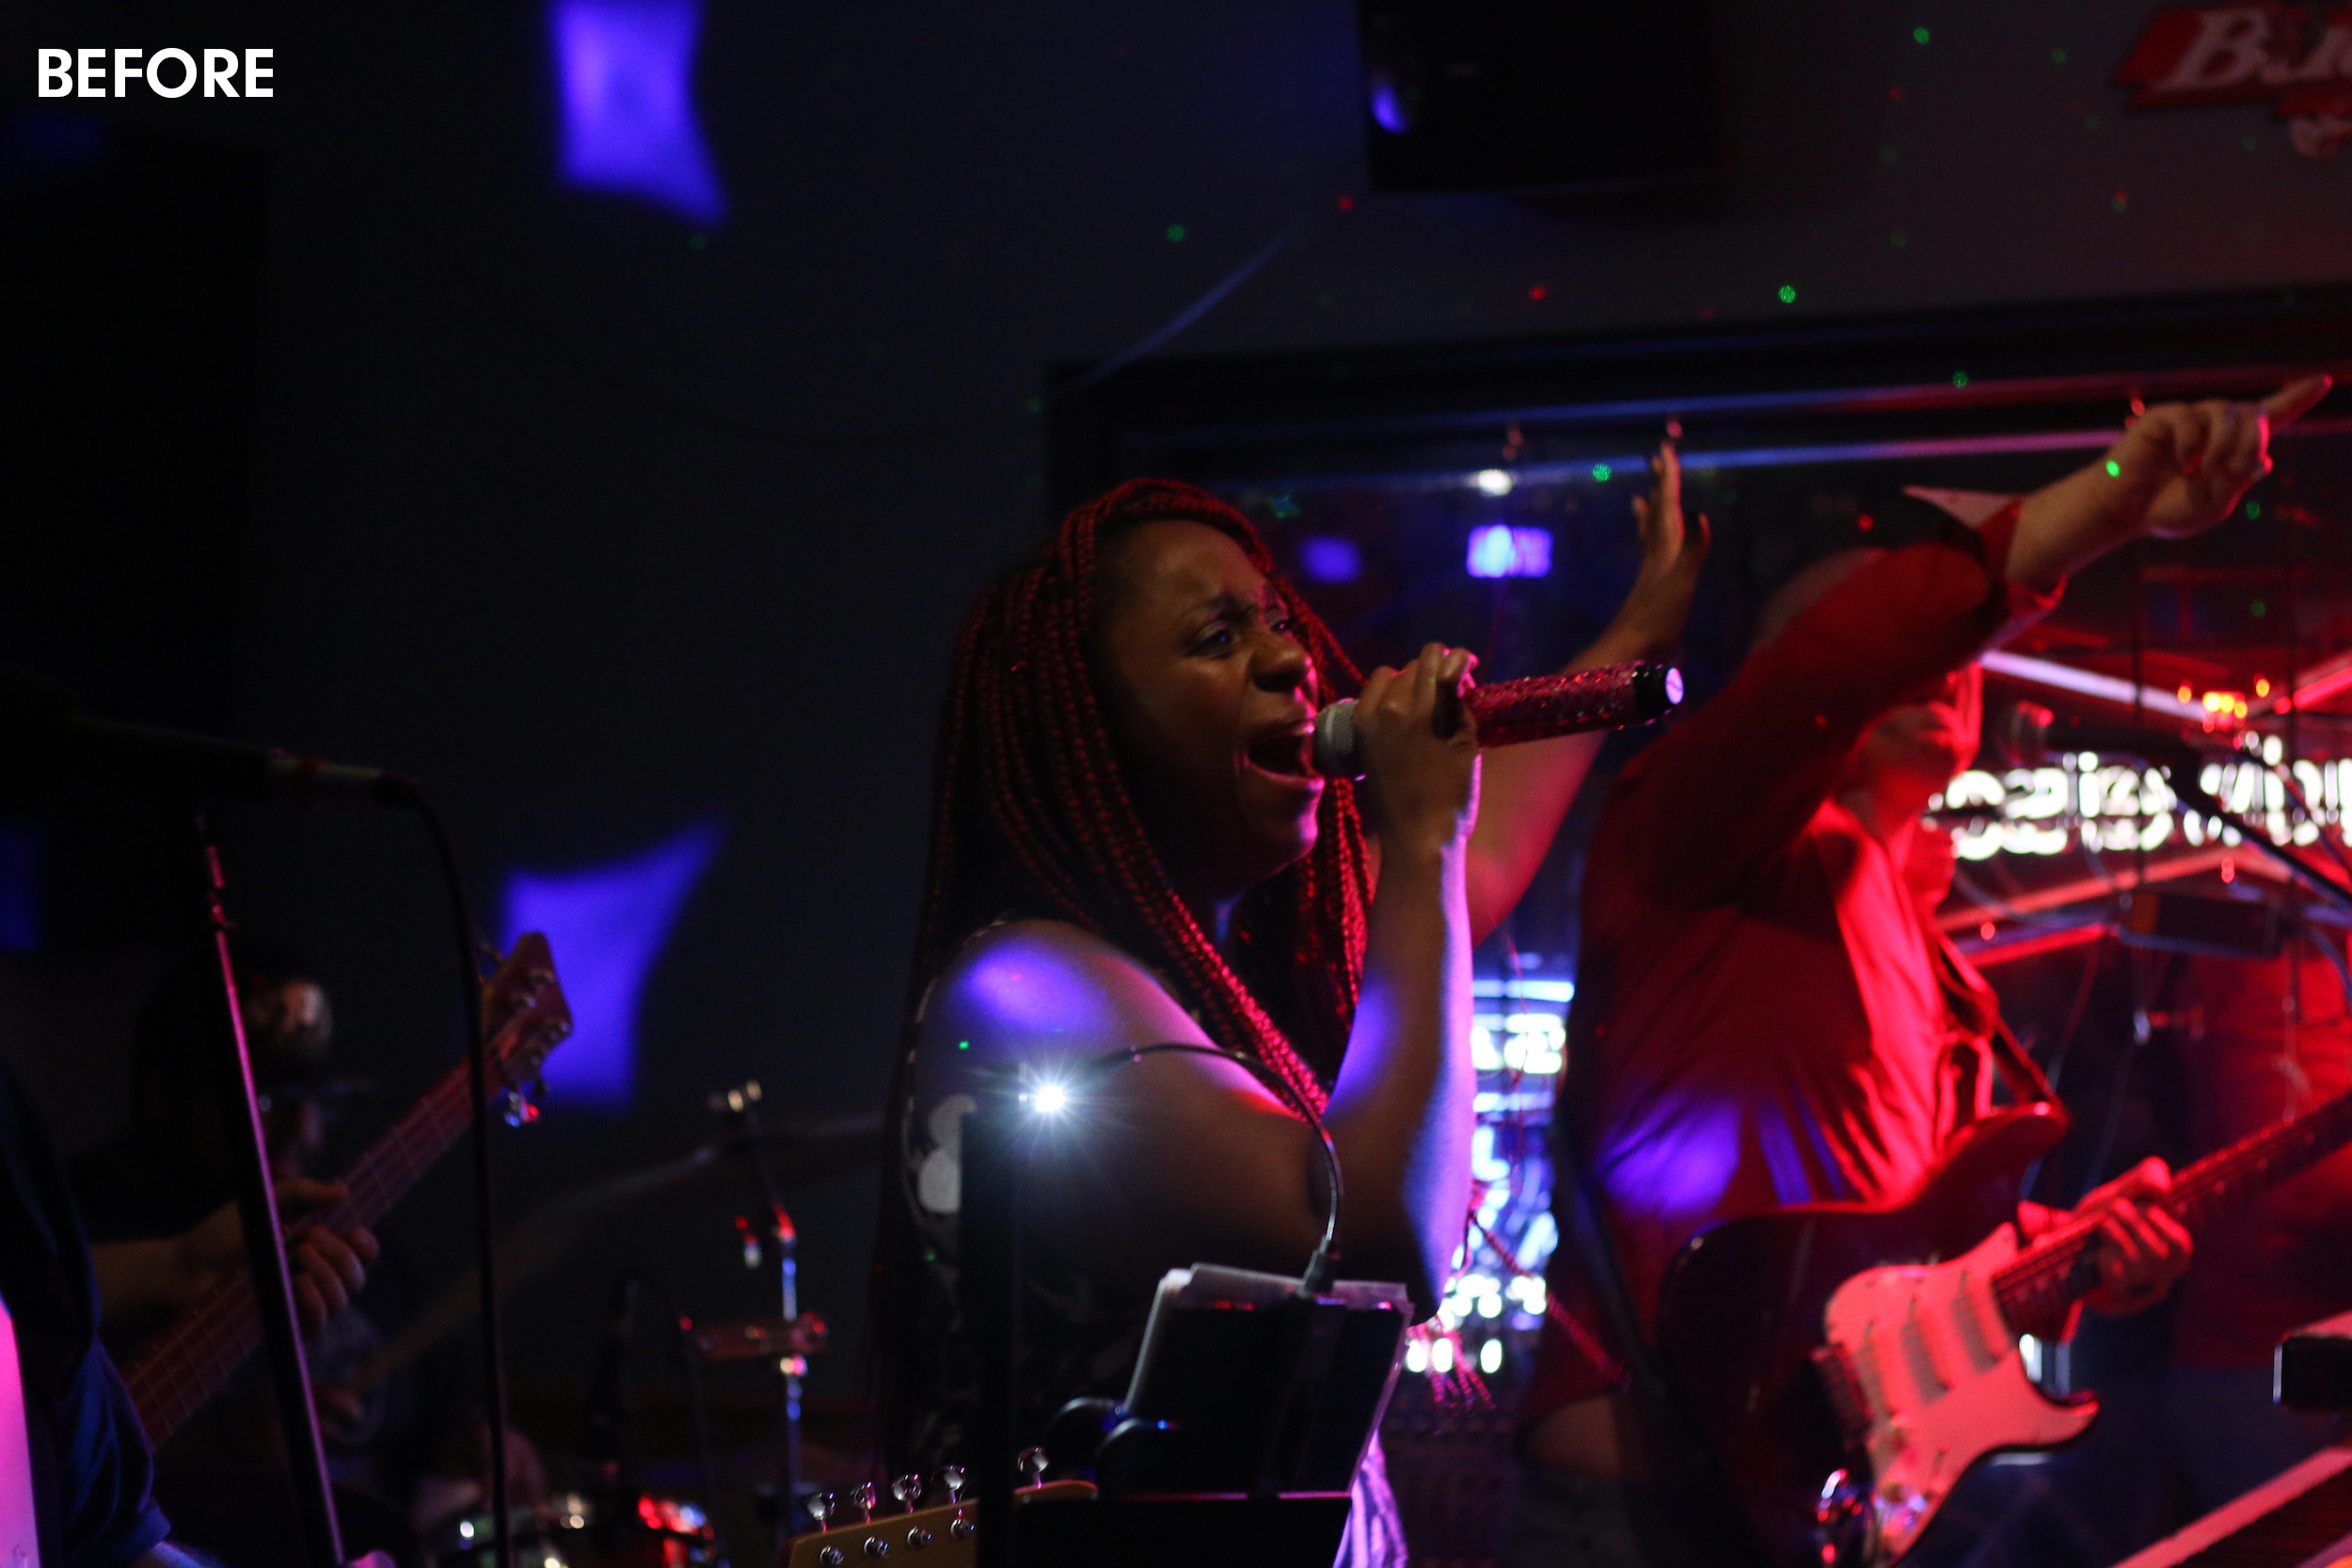 singer-glastoneschickpeach-lightroom-presets9.jpg